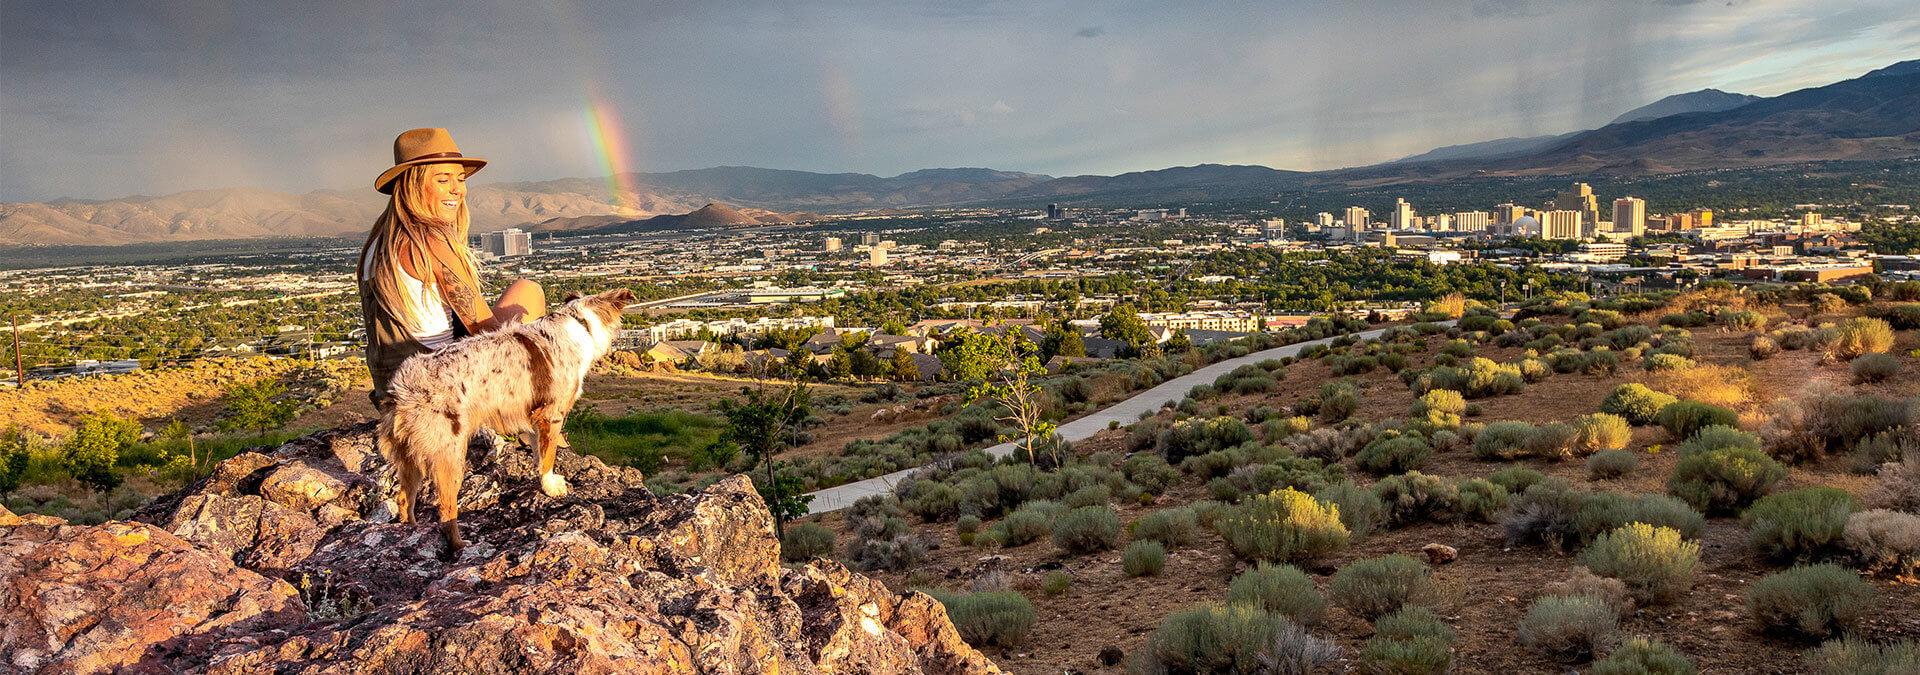 Reno Skyline with Rainbow